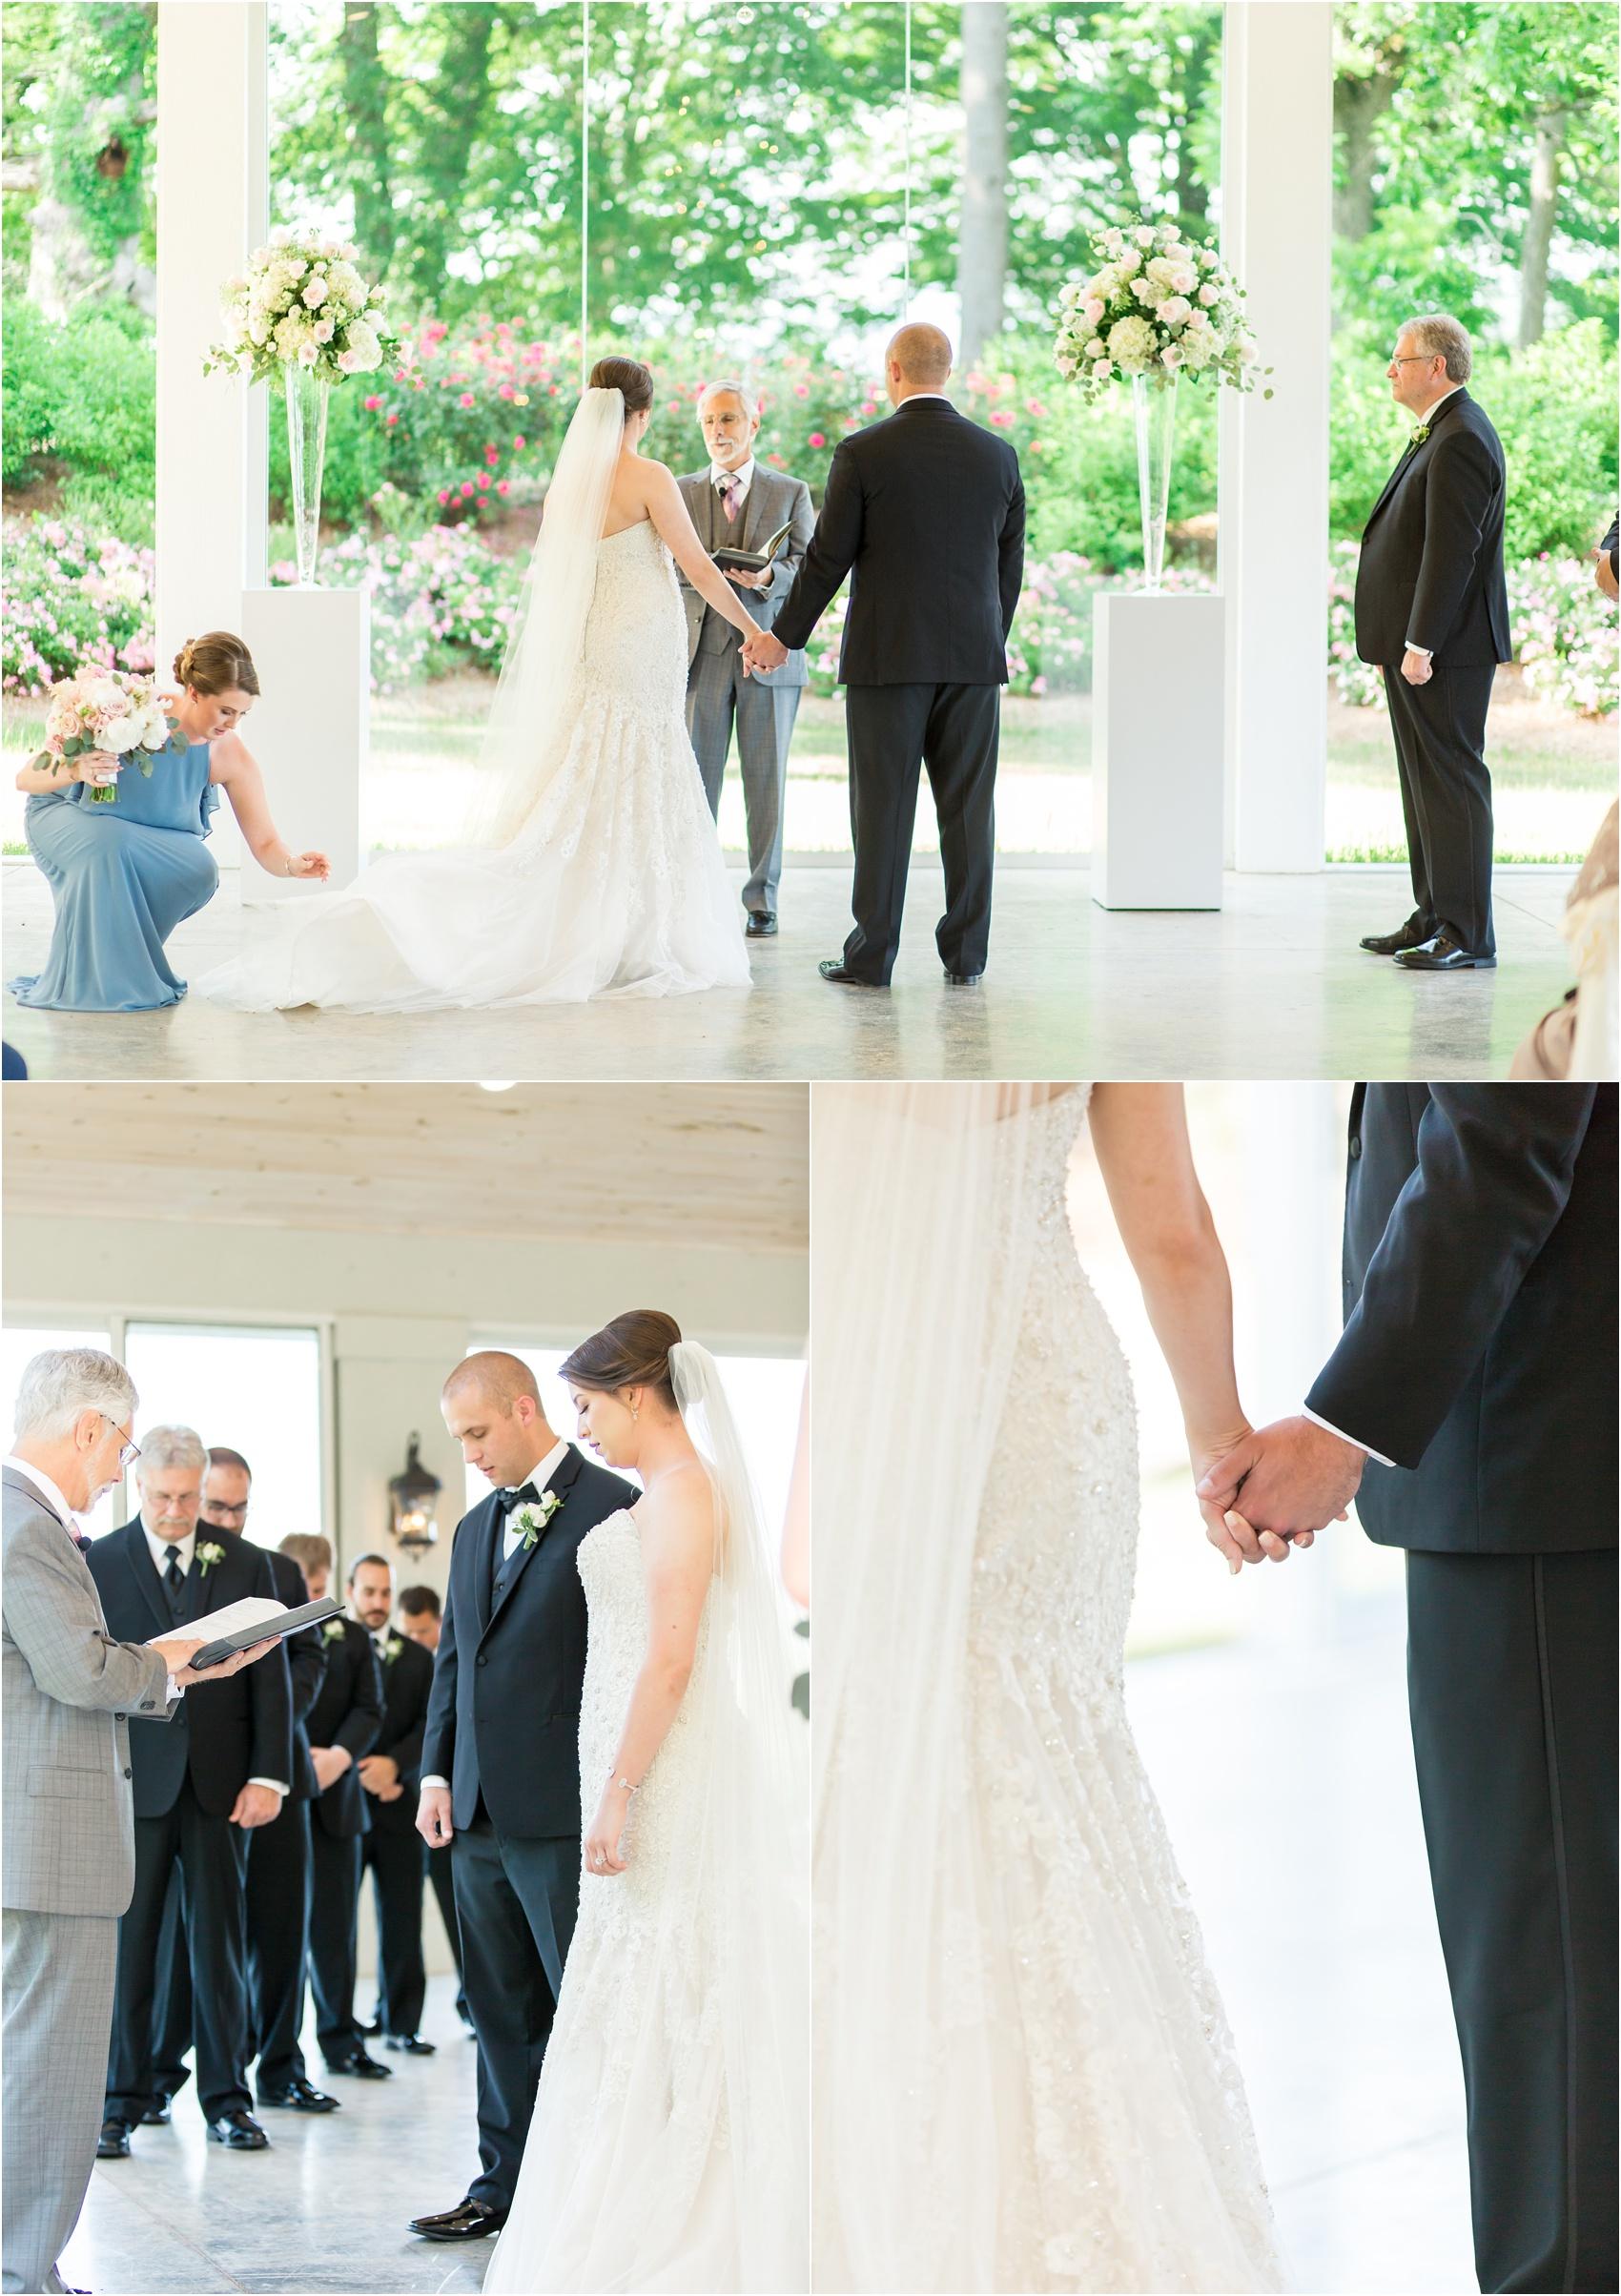 Savannah Eve Photography- Nutt Wedding- Blog-73.jpg